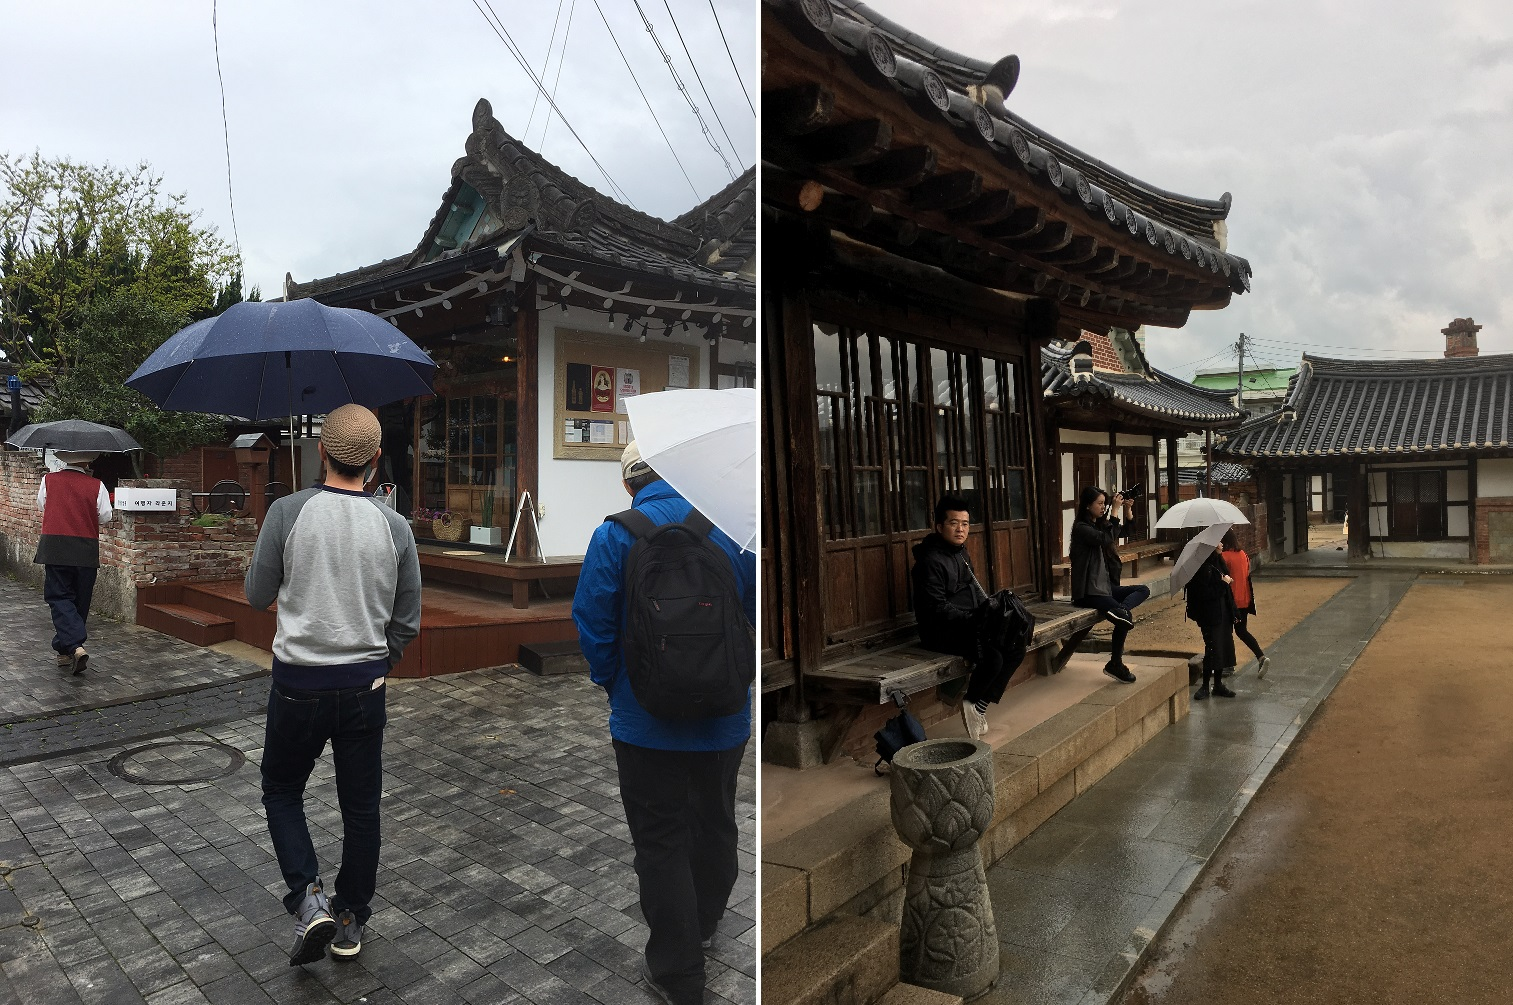 People with umbrellas walk through traditional Korean buildings